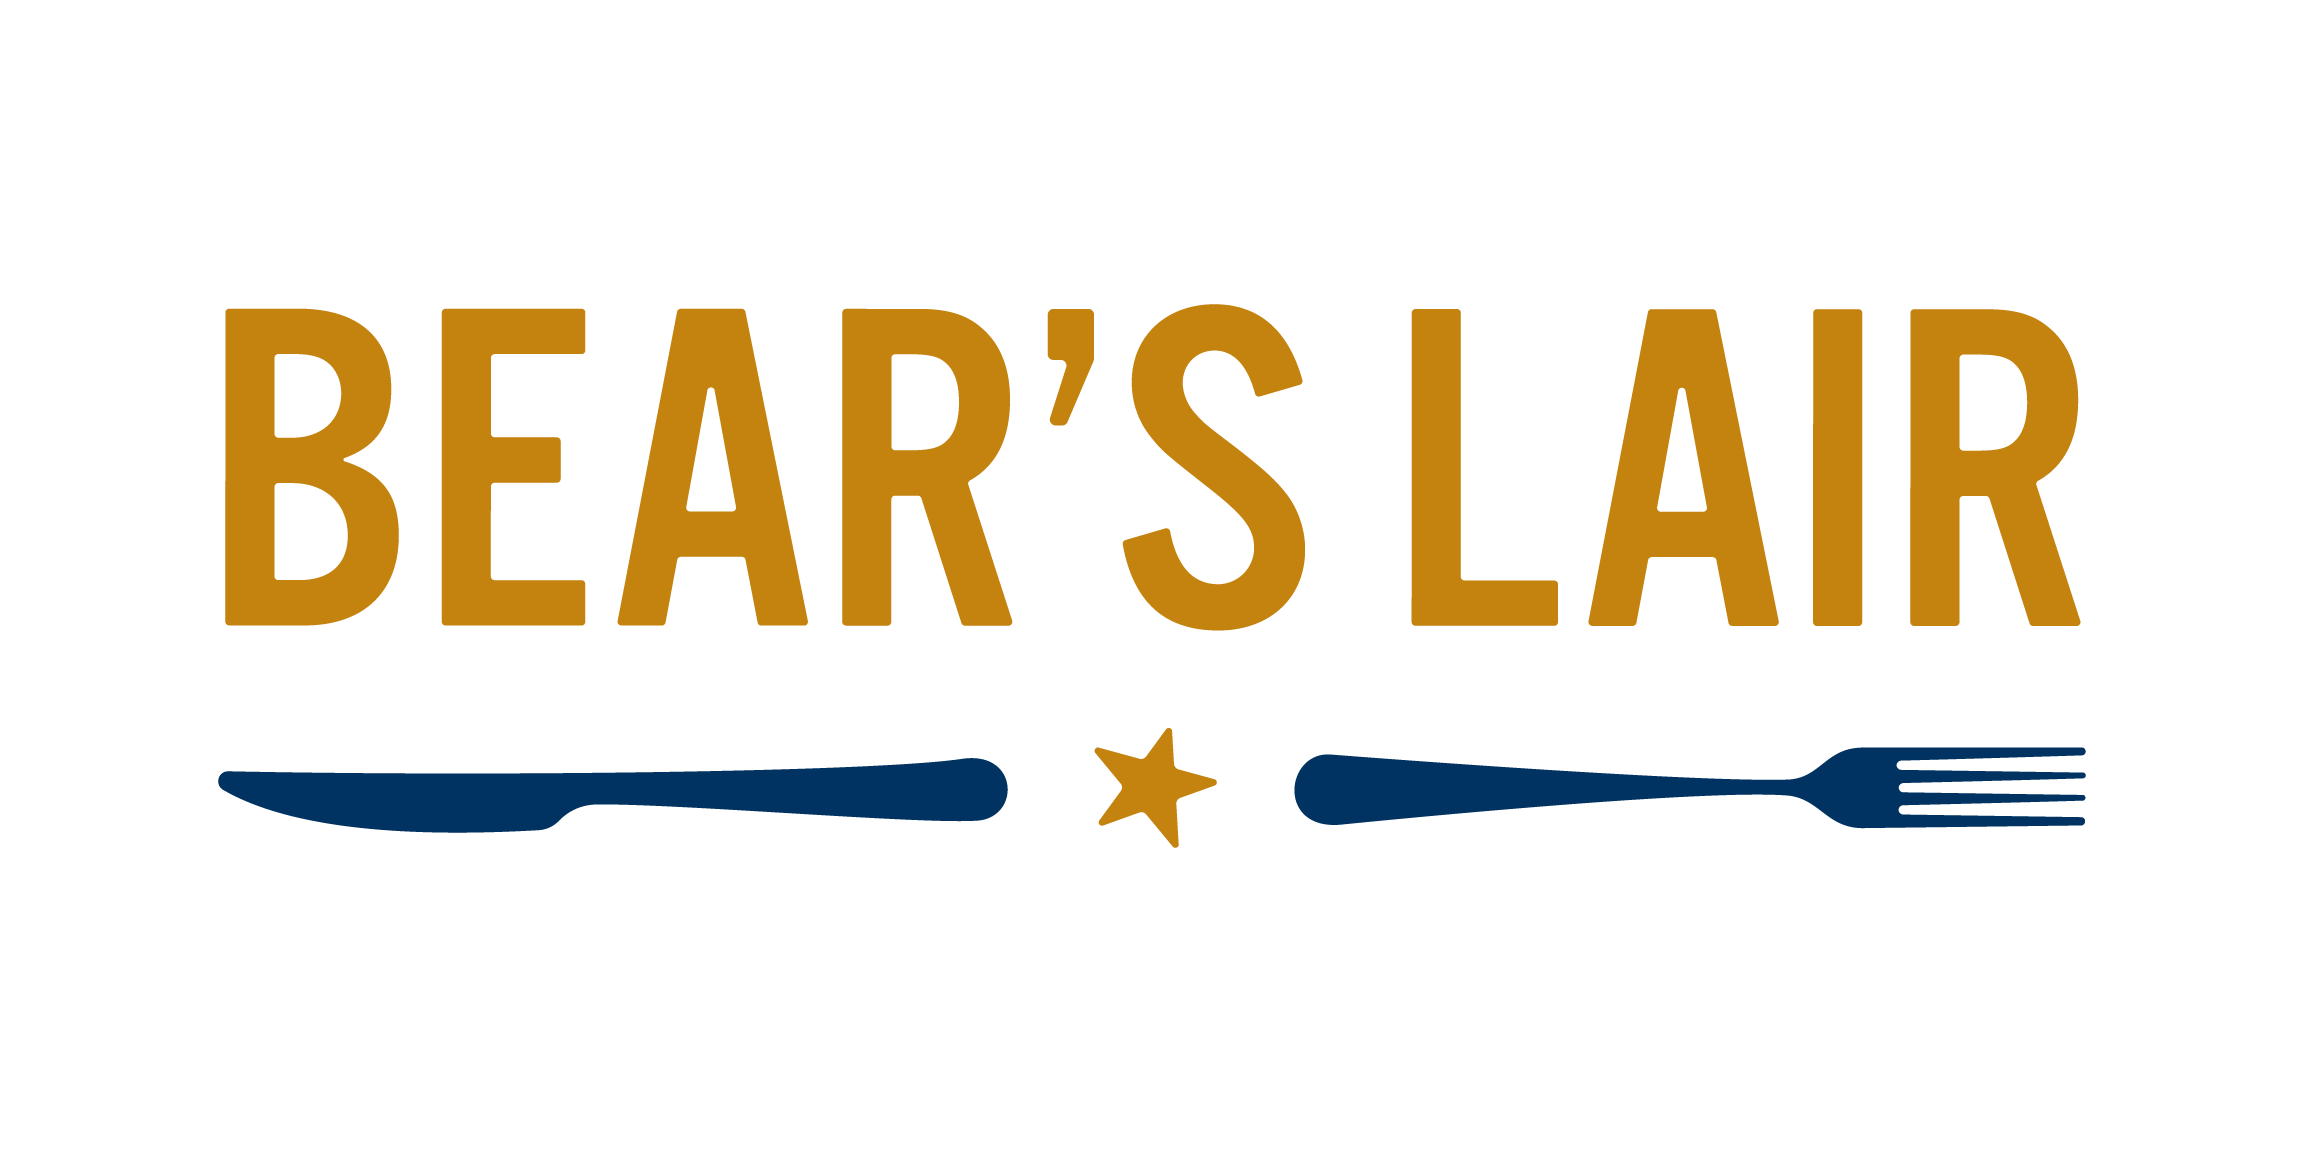 Bears Lair logo